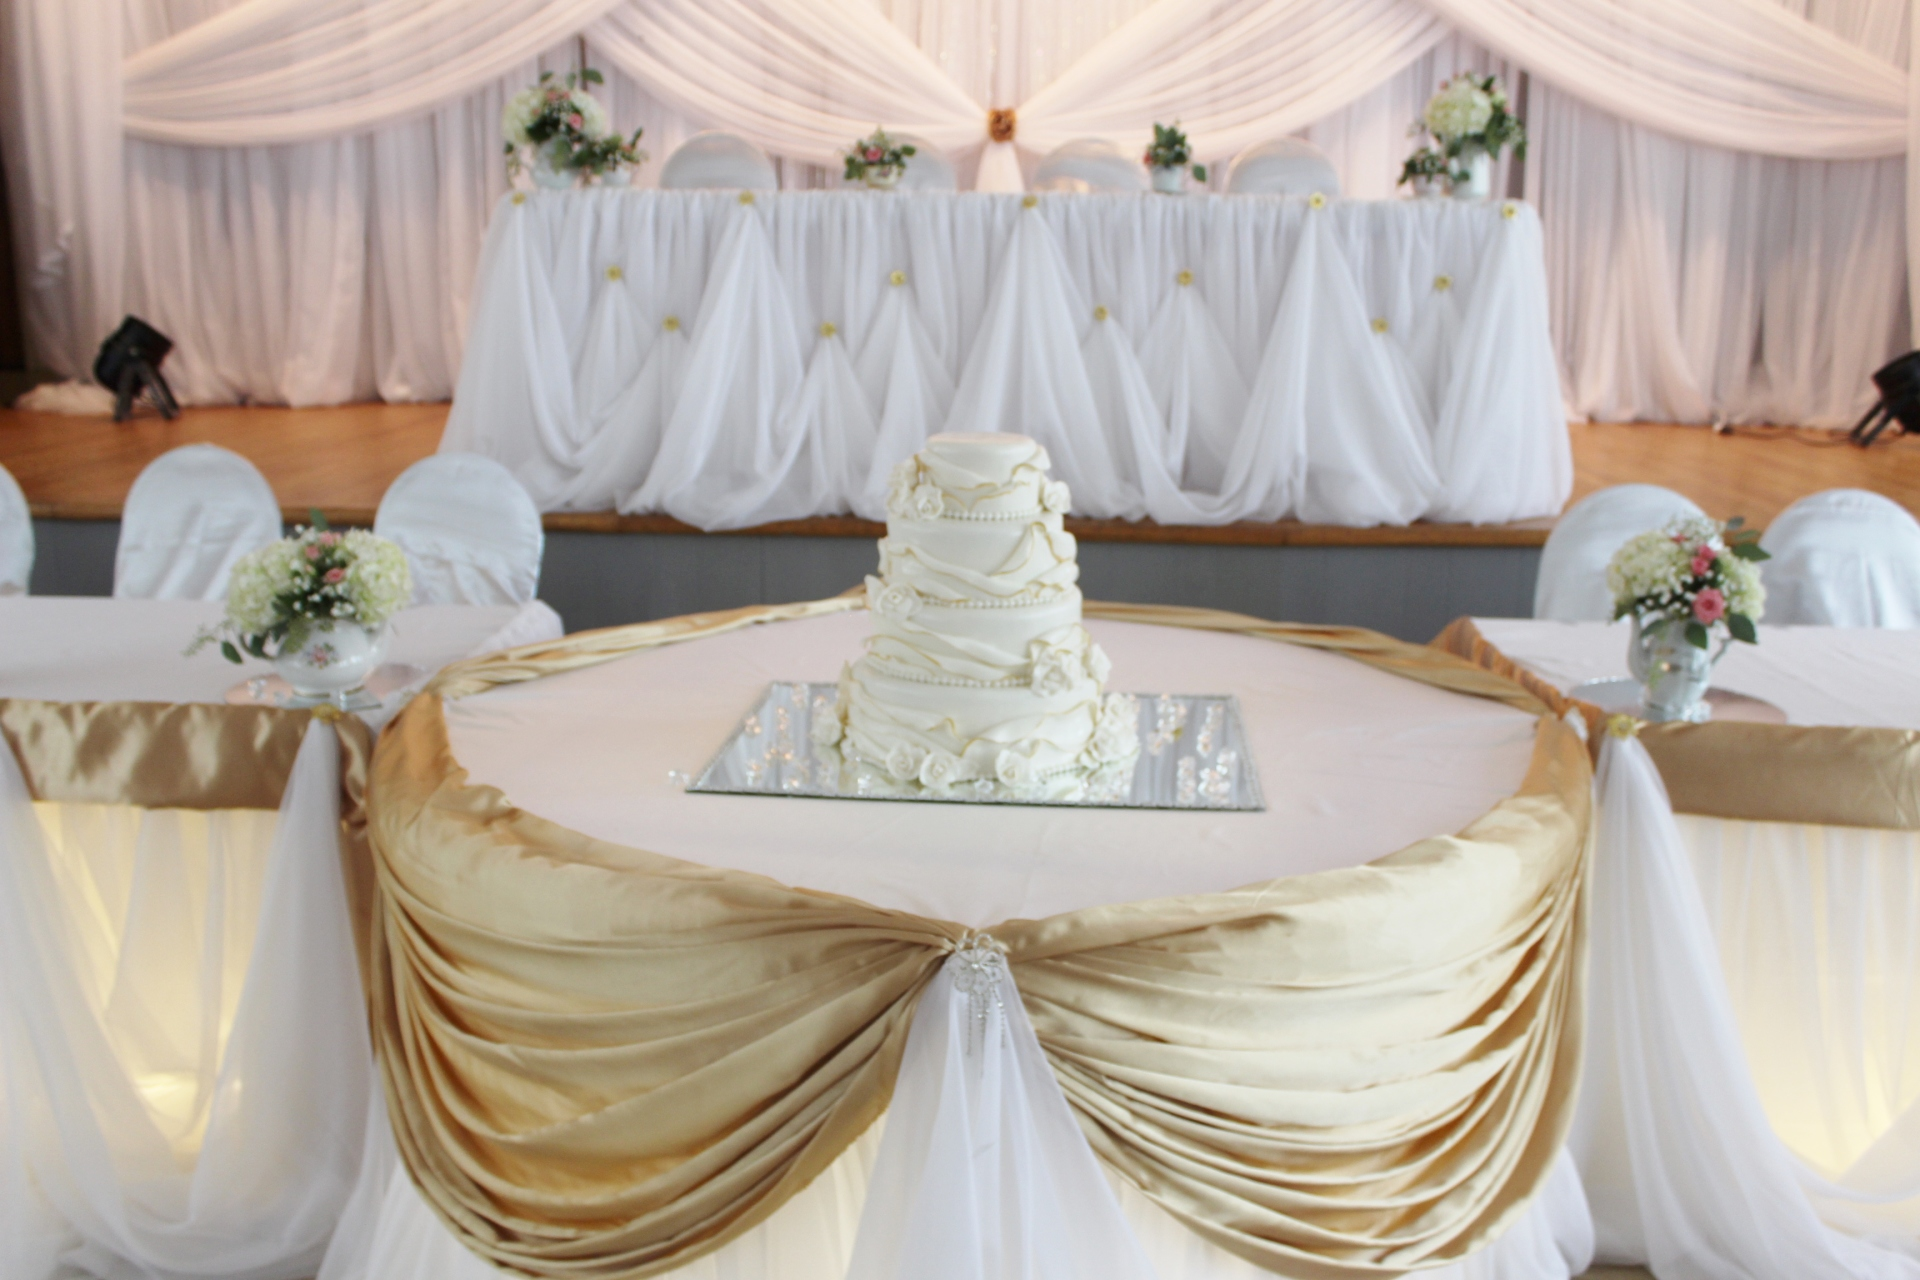 White and gold ruffled wedding